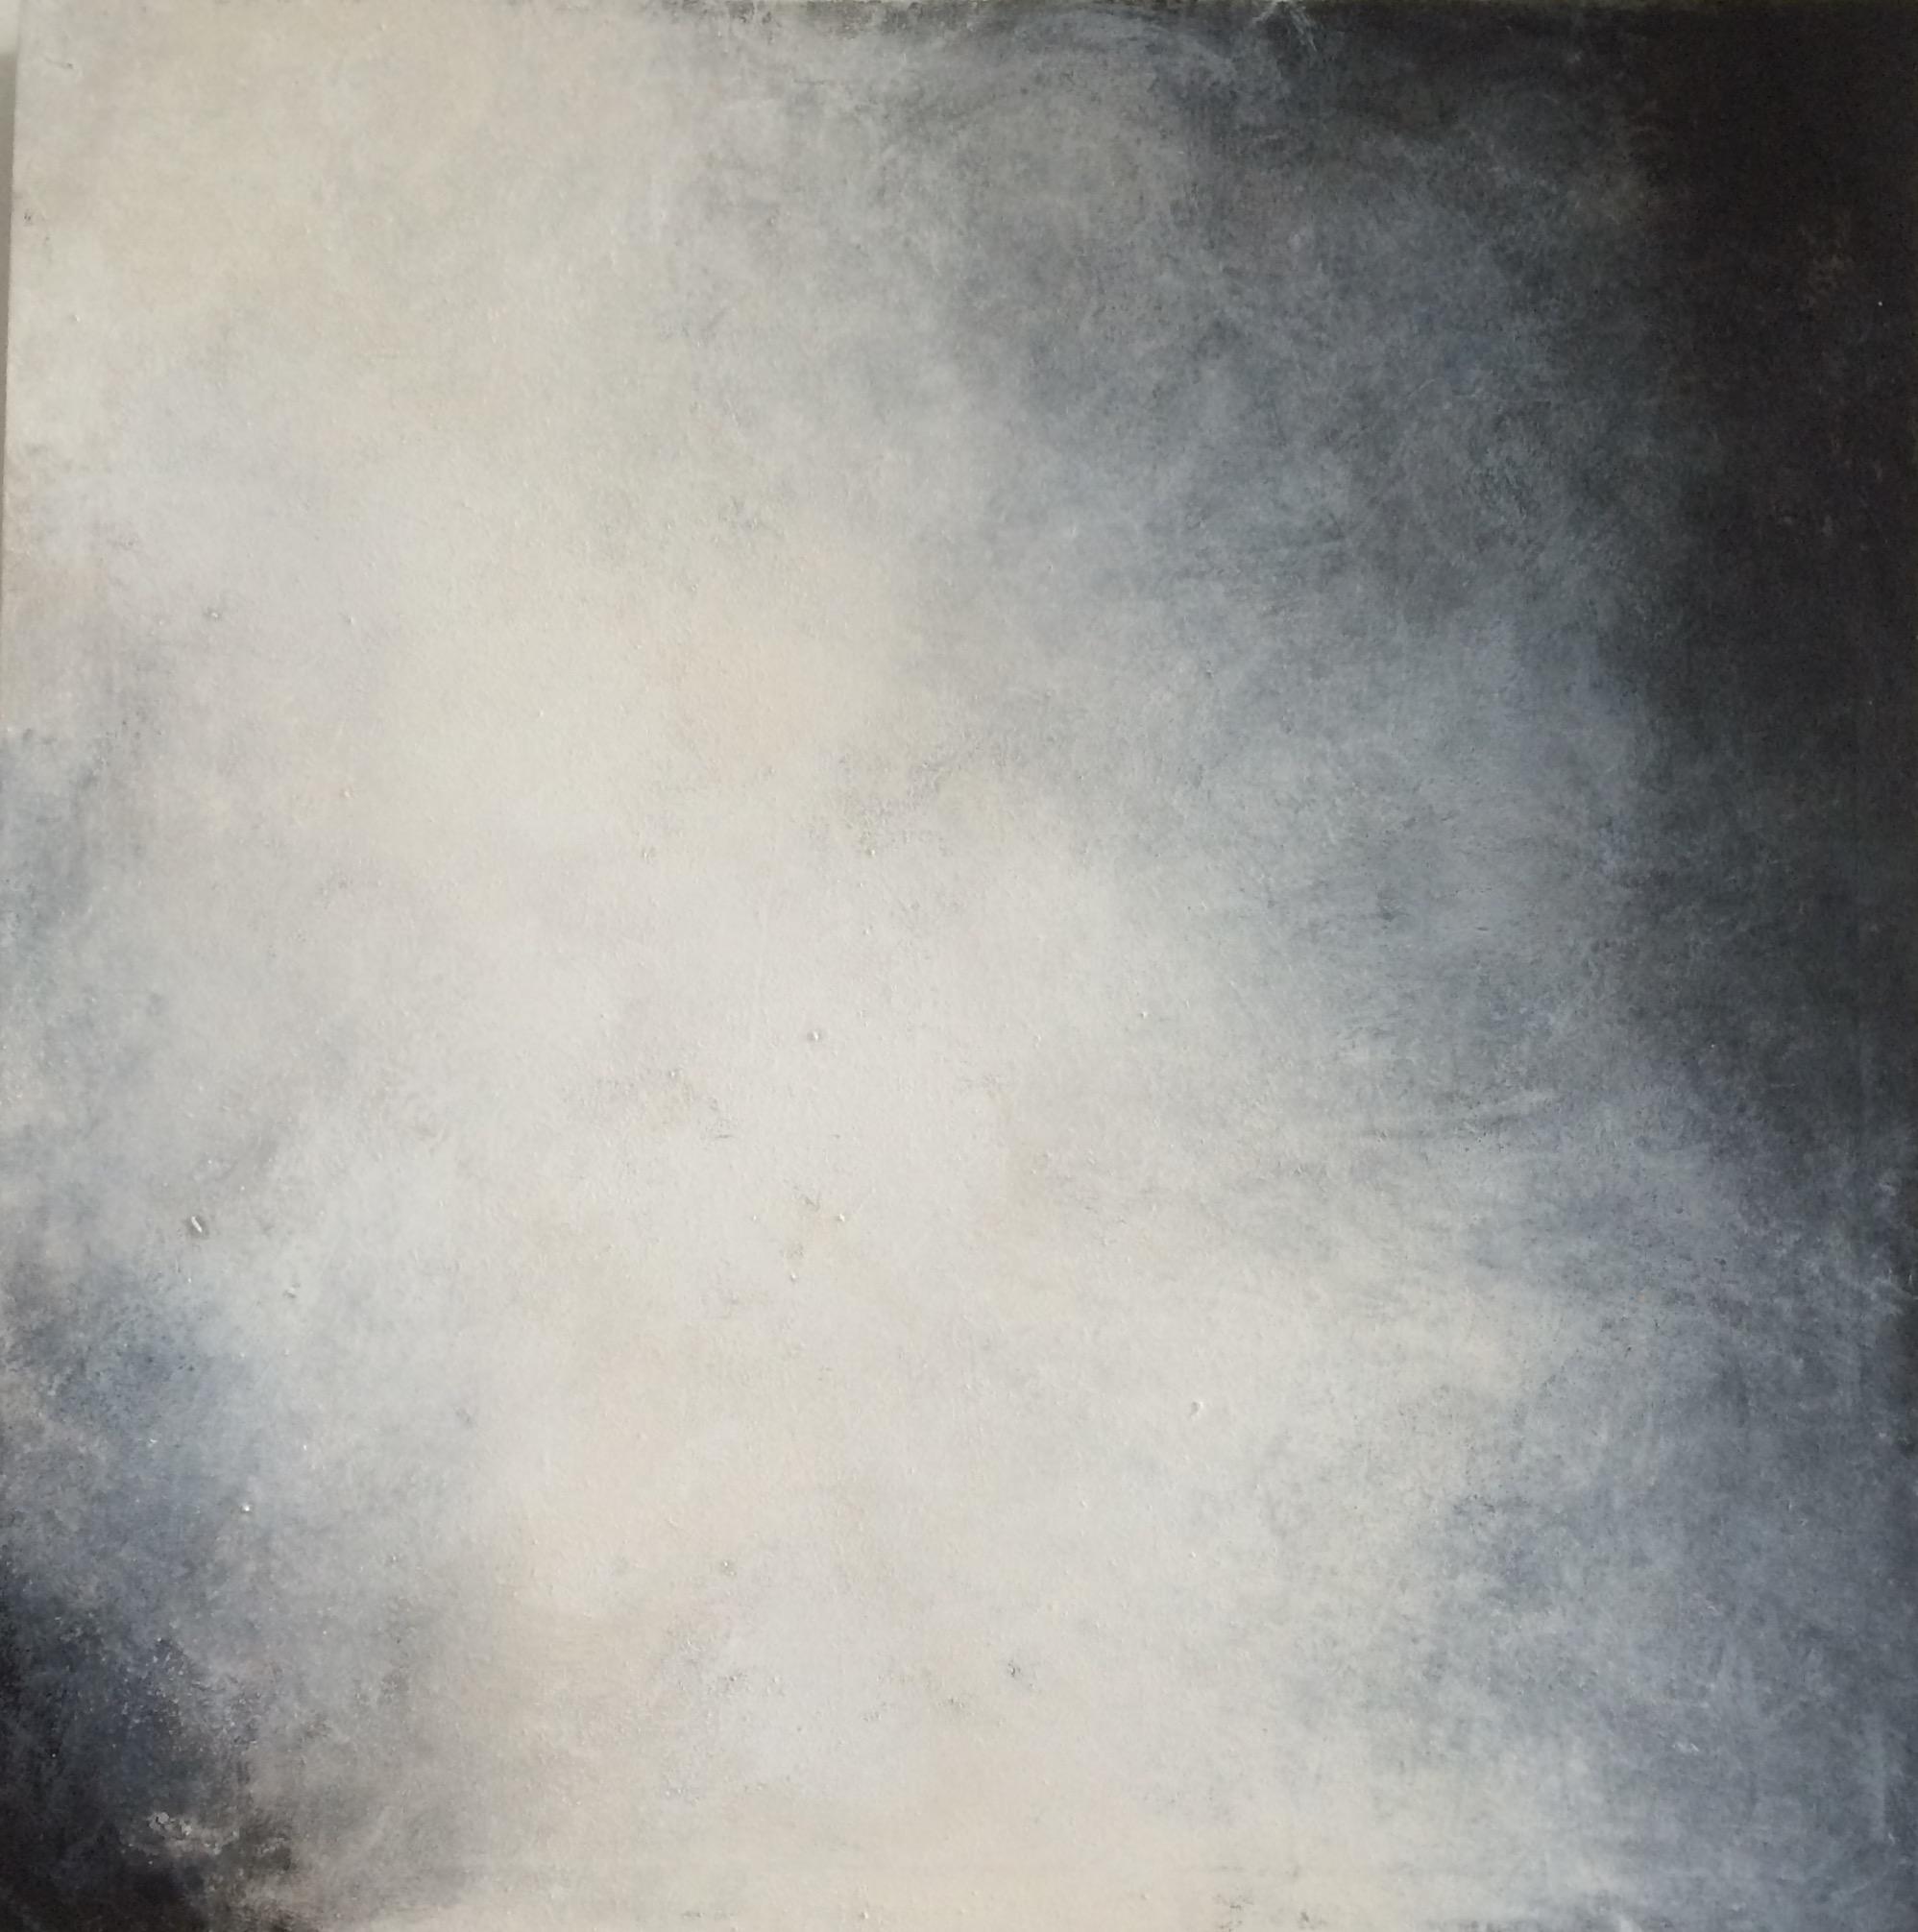 Acrylic on canvas 21X21 Buy $250 Rent $50 week